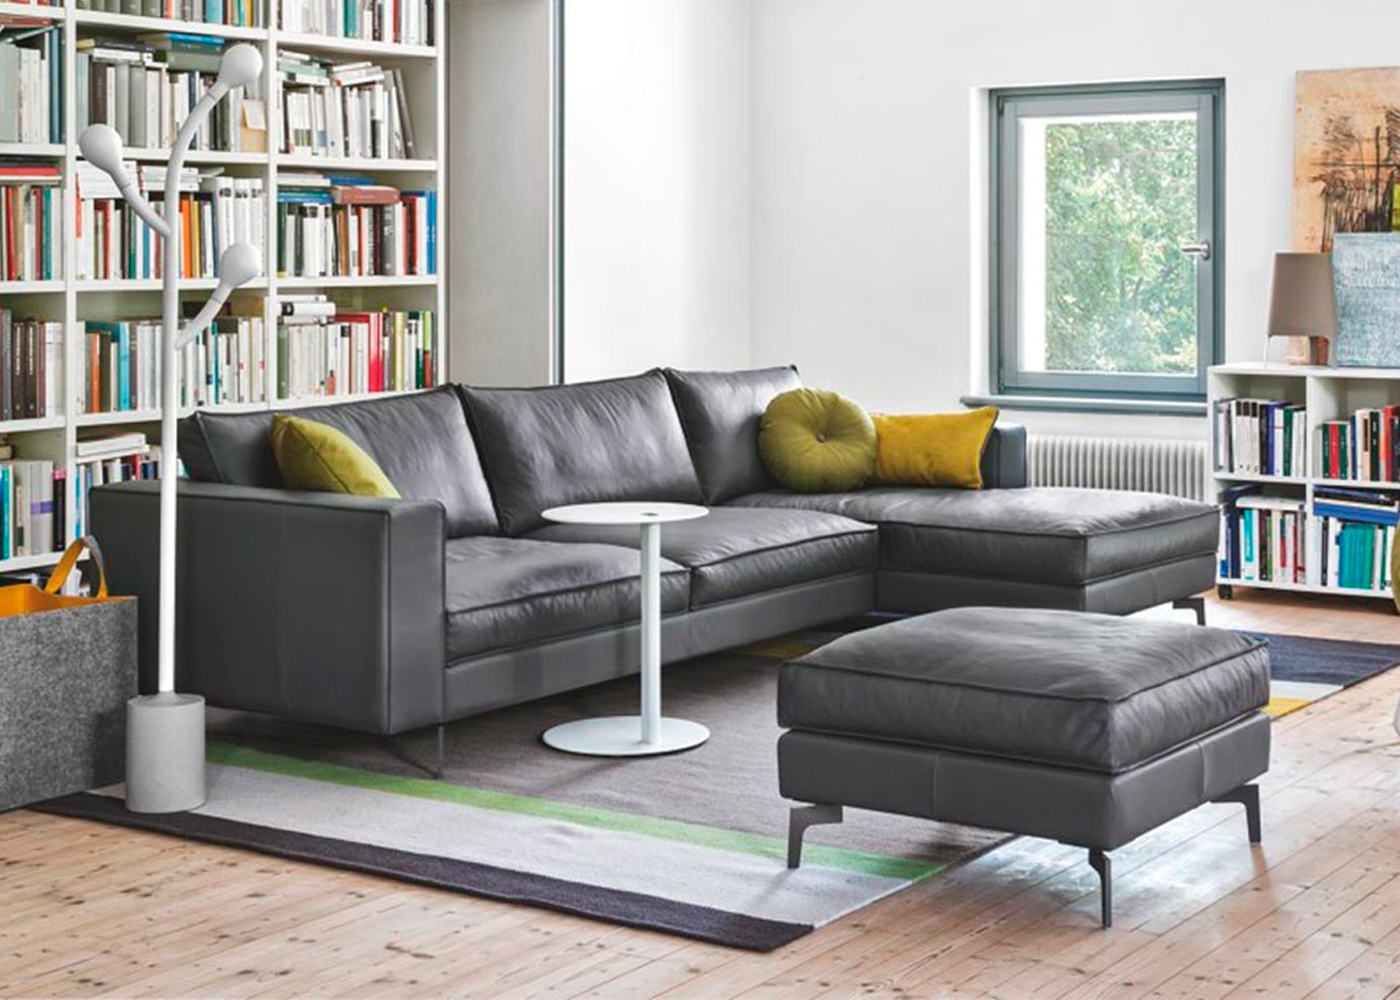 calligaris sofas uk sofa side table slide under square corner midfurn furniture superstore